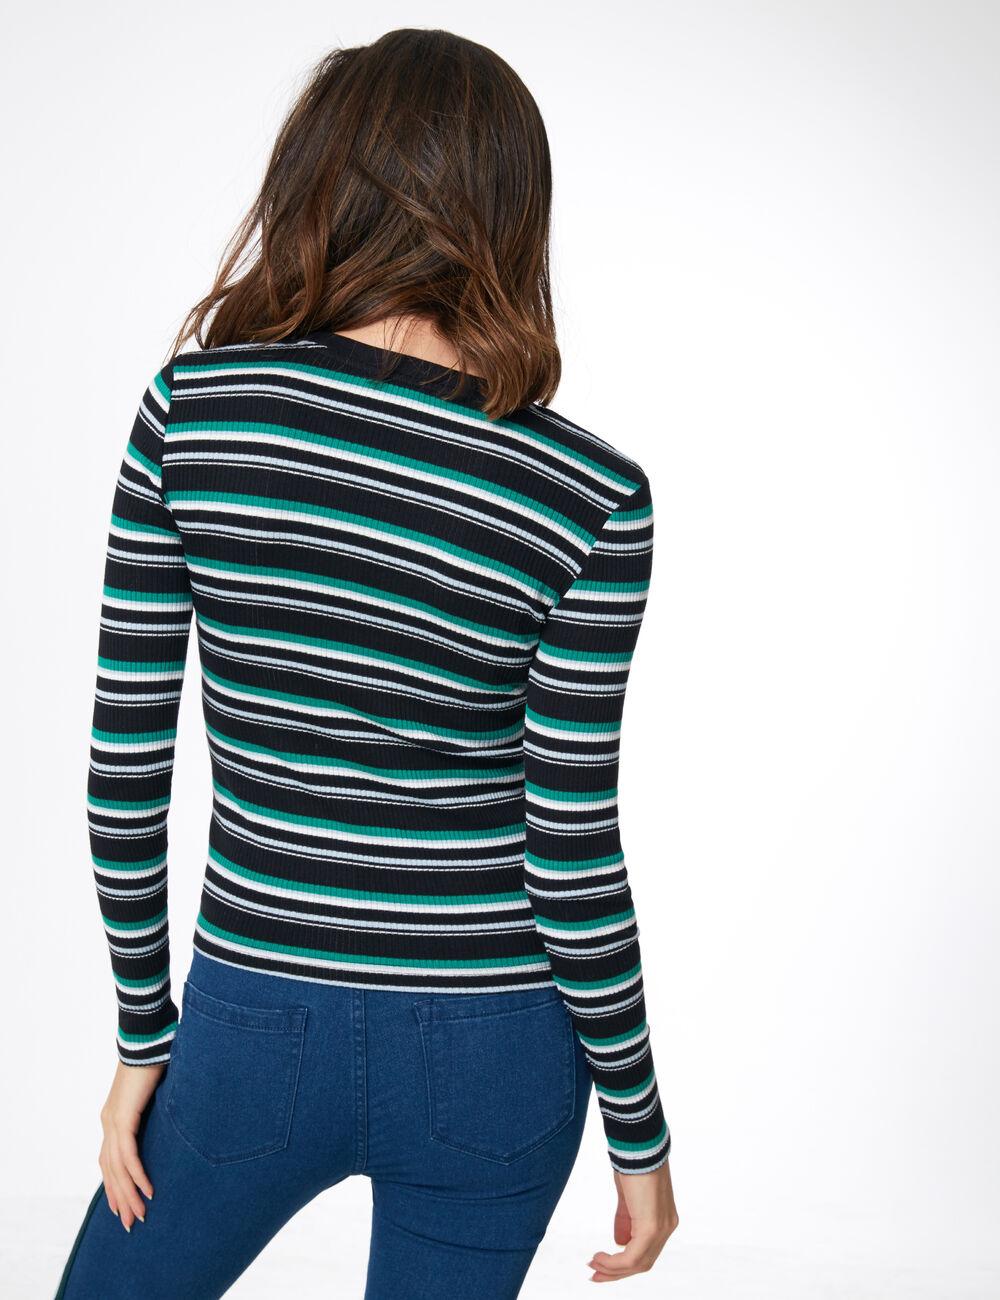 Tee-shirt côtelé rayé noir, vert, blanc et bleu clair